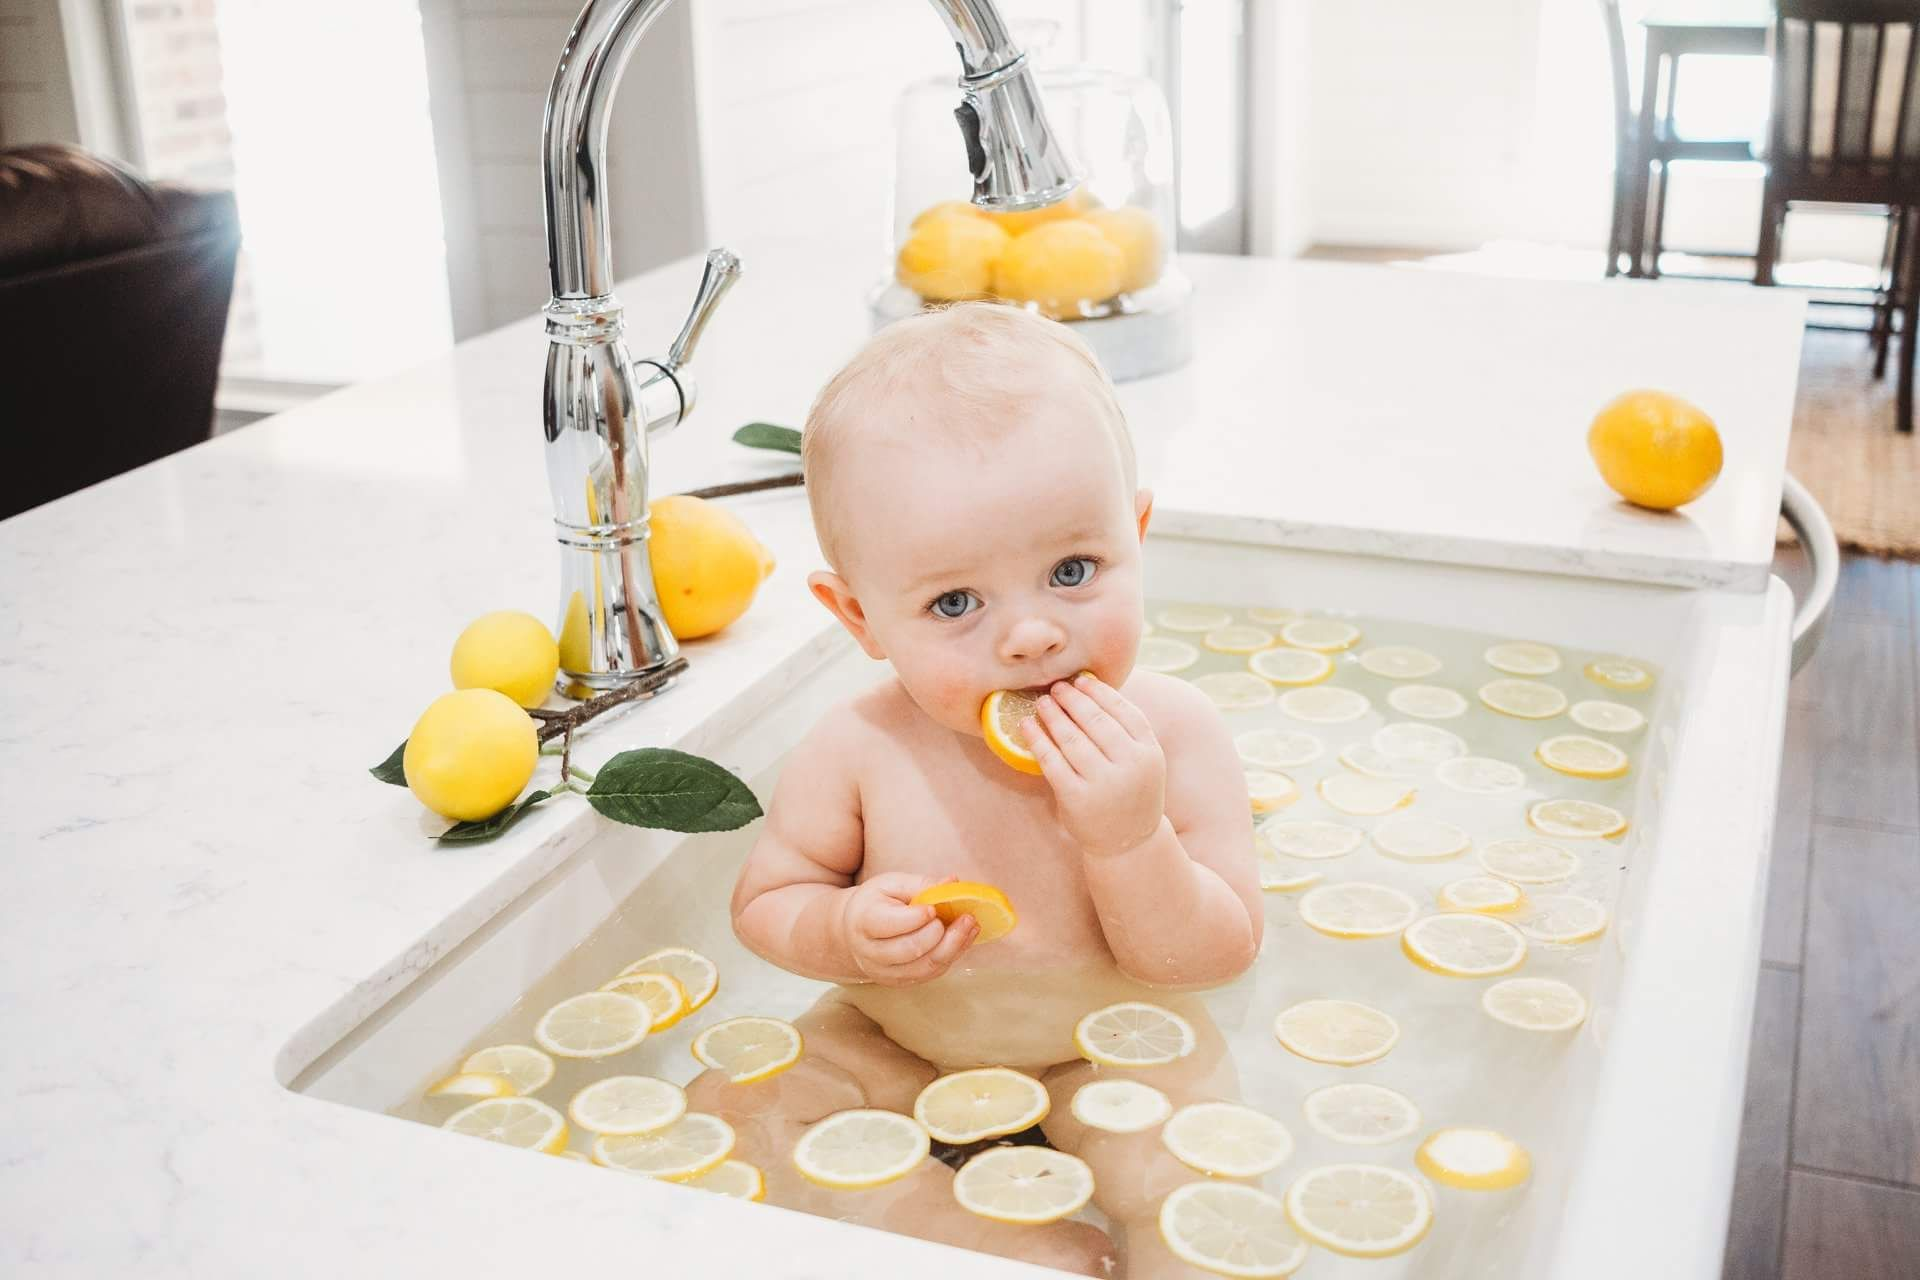 Baby birthday fruit bath photoshoot | Fruit Bath Ideas | Pinterest ...